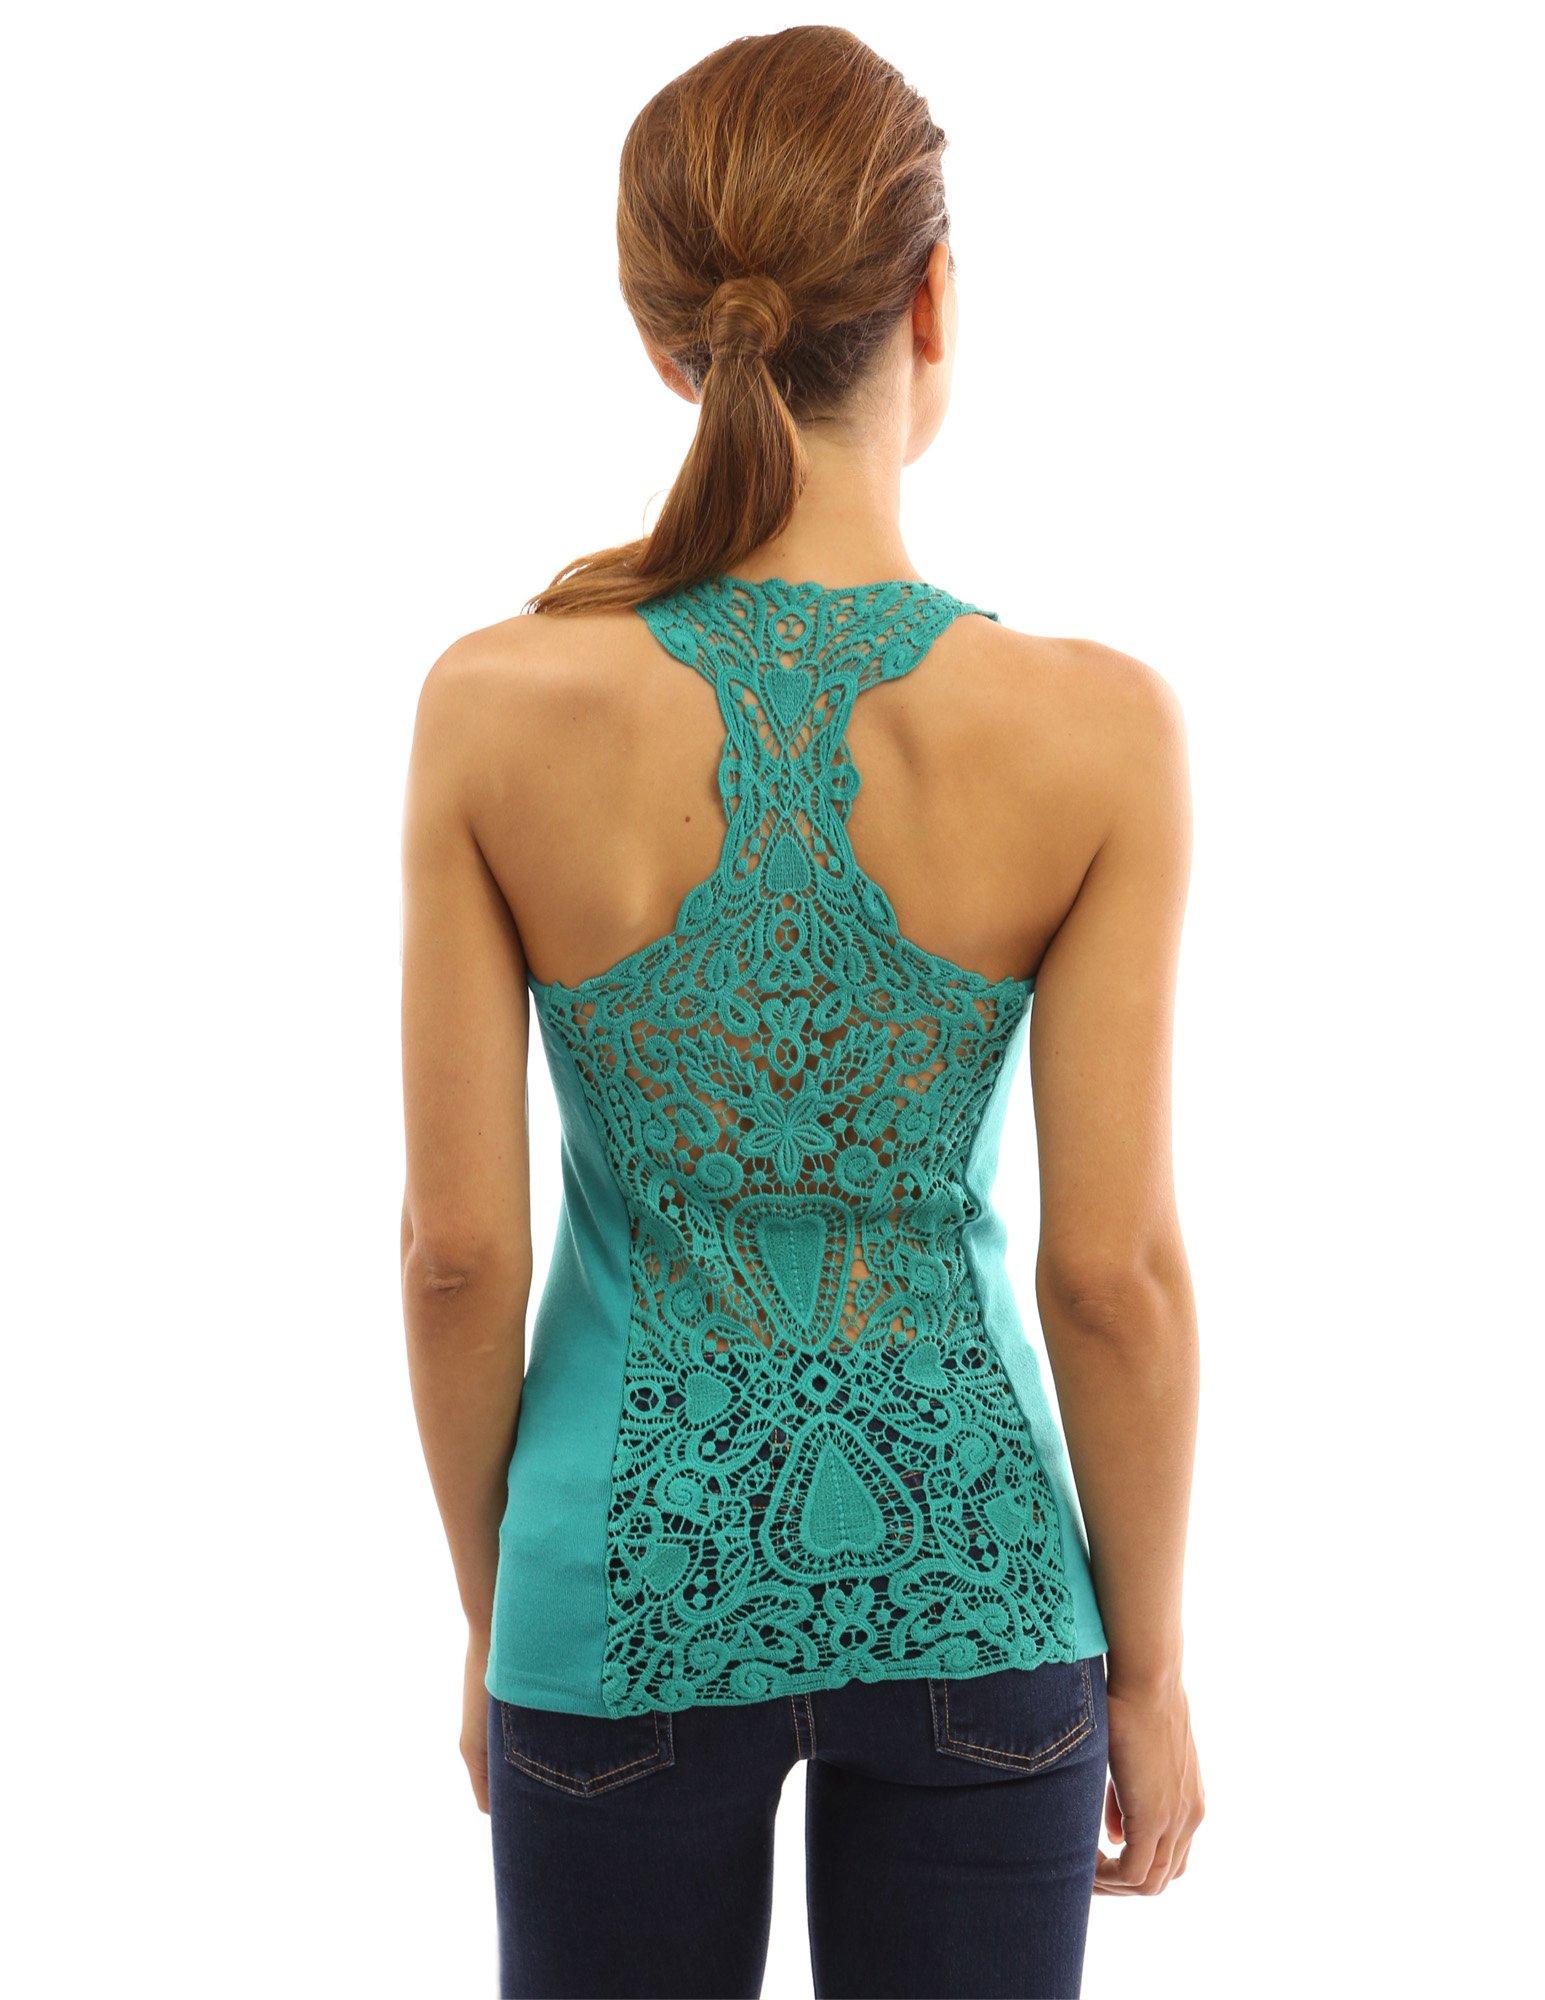 PattyBoutik Women's Crochet Lace Racerback Tank Top (Turquoise S)